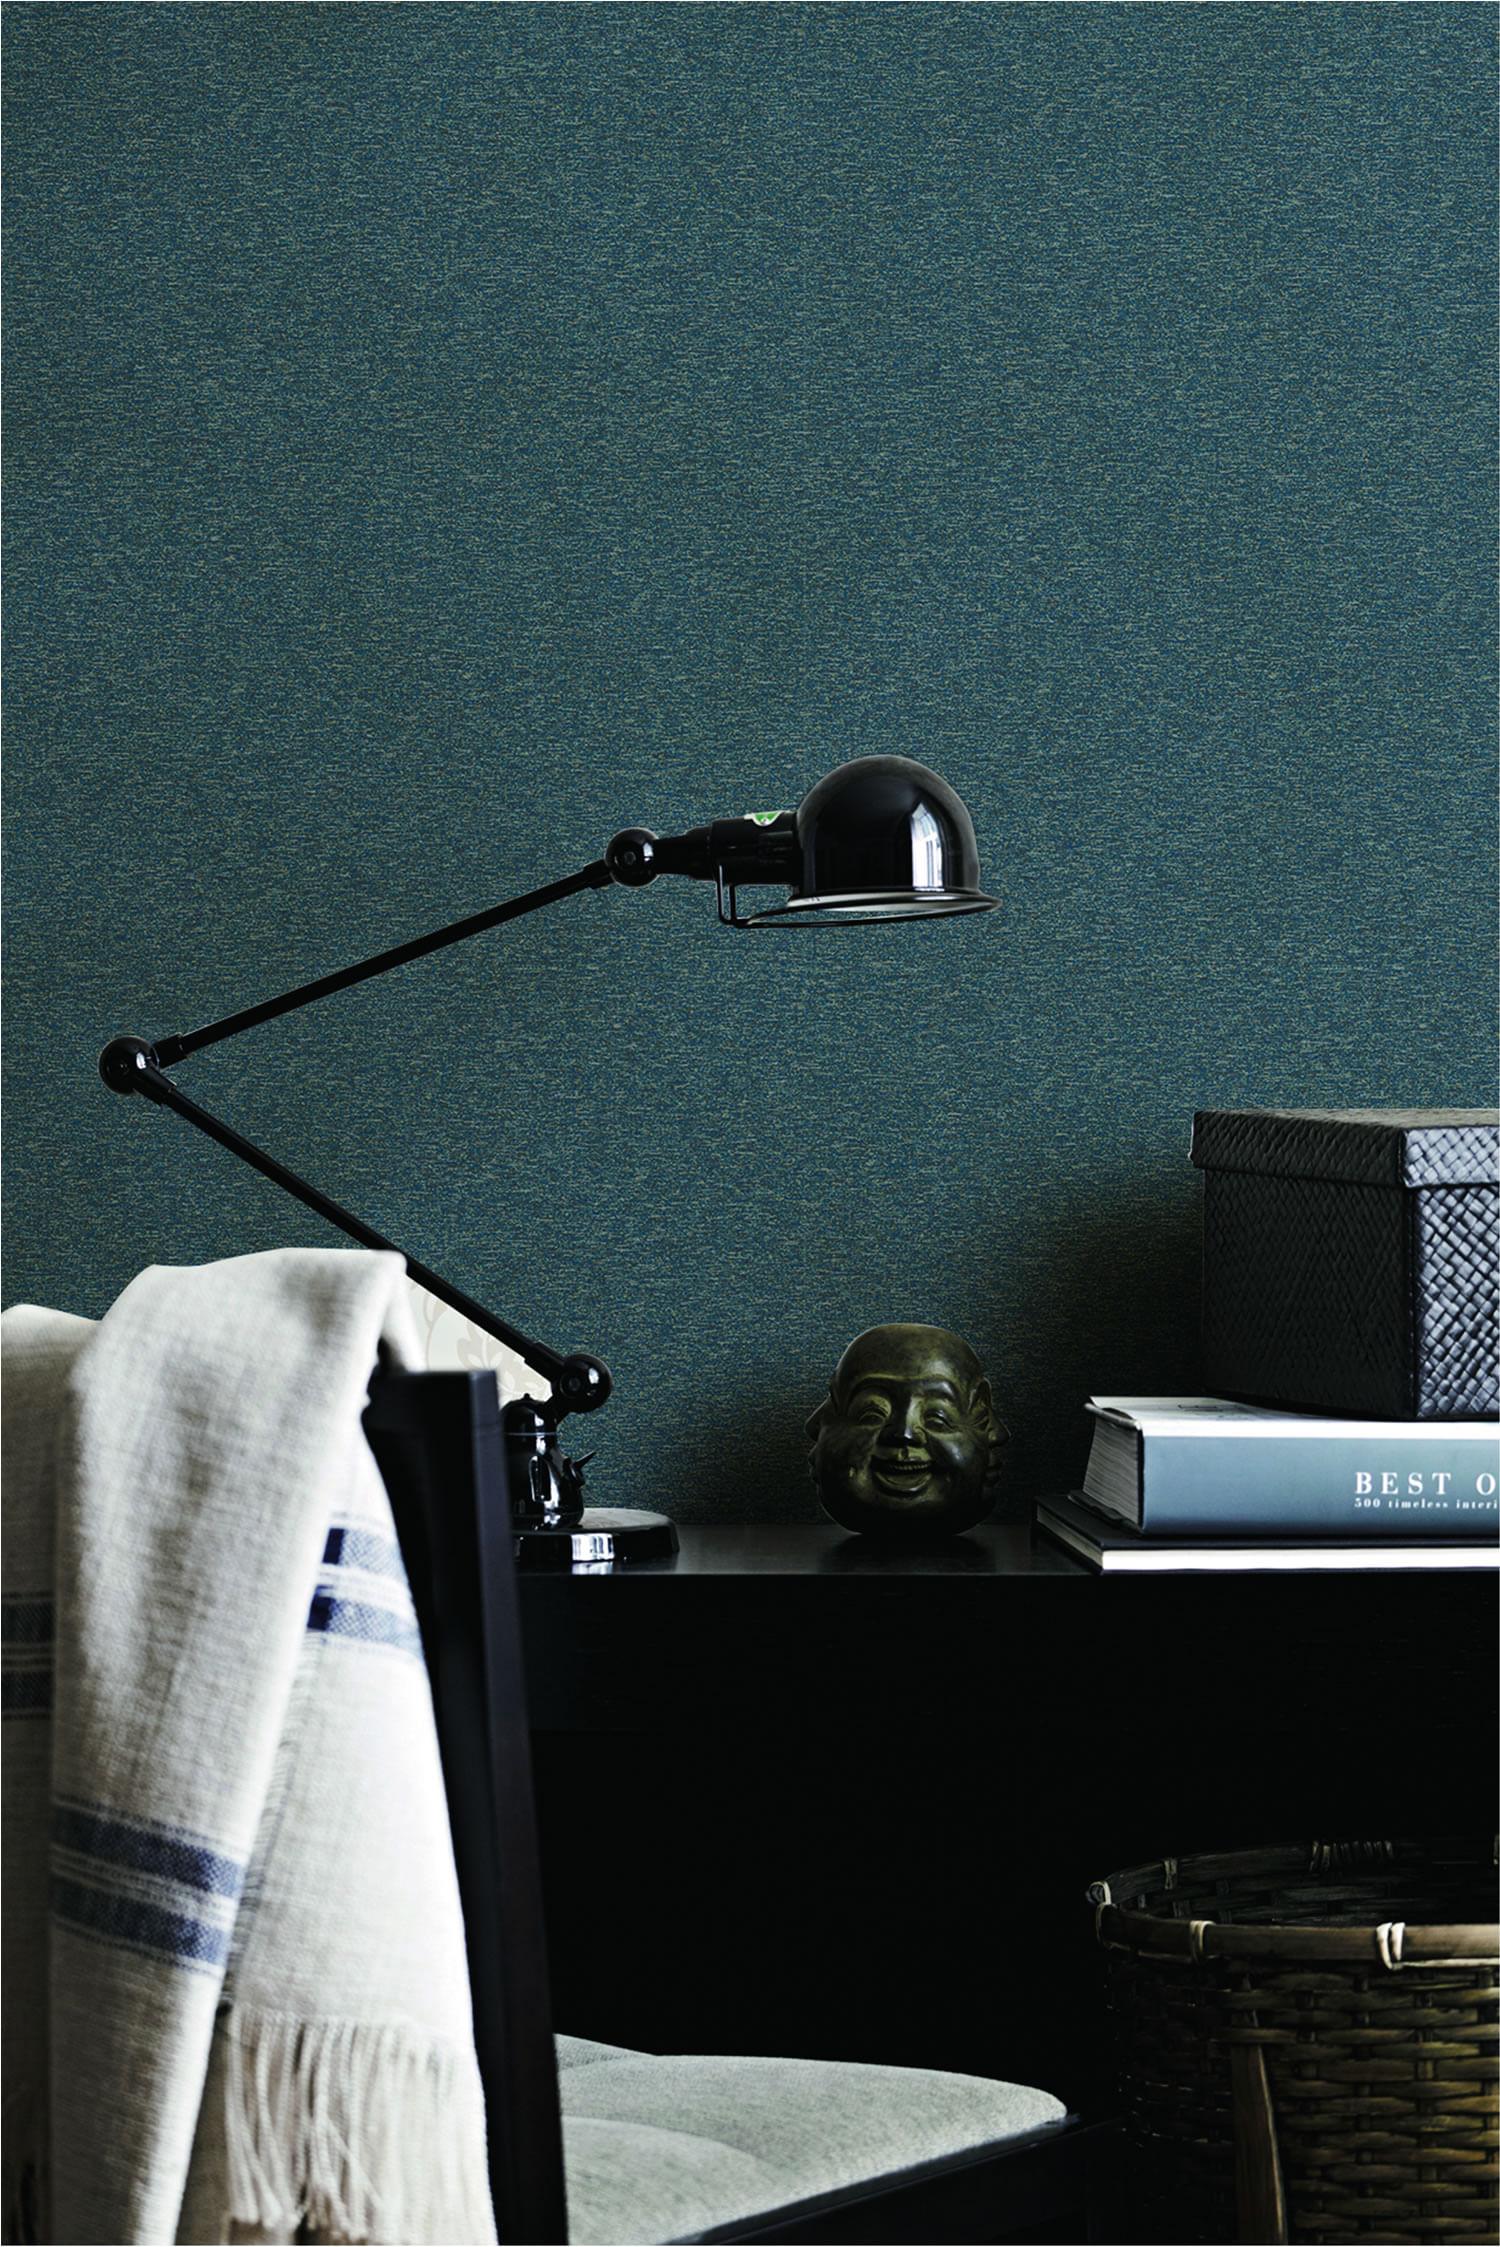 Papel de Parede Modern Maison Aspecto Tecido MM544007 - Rolo: 10m x 0,52m